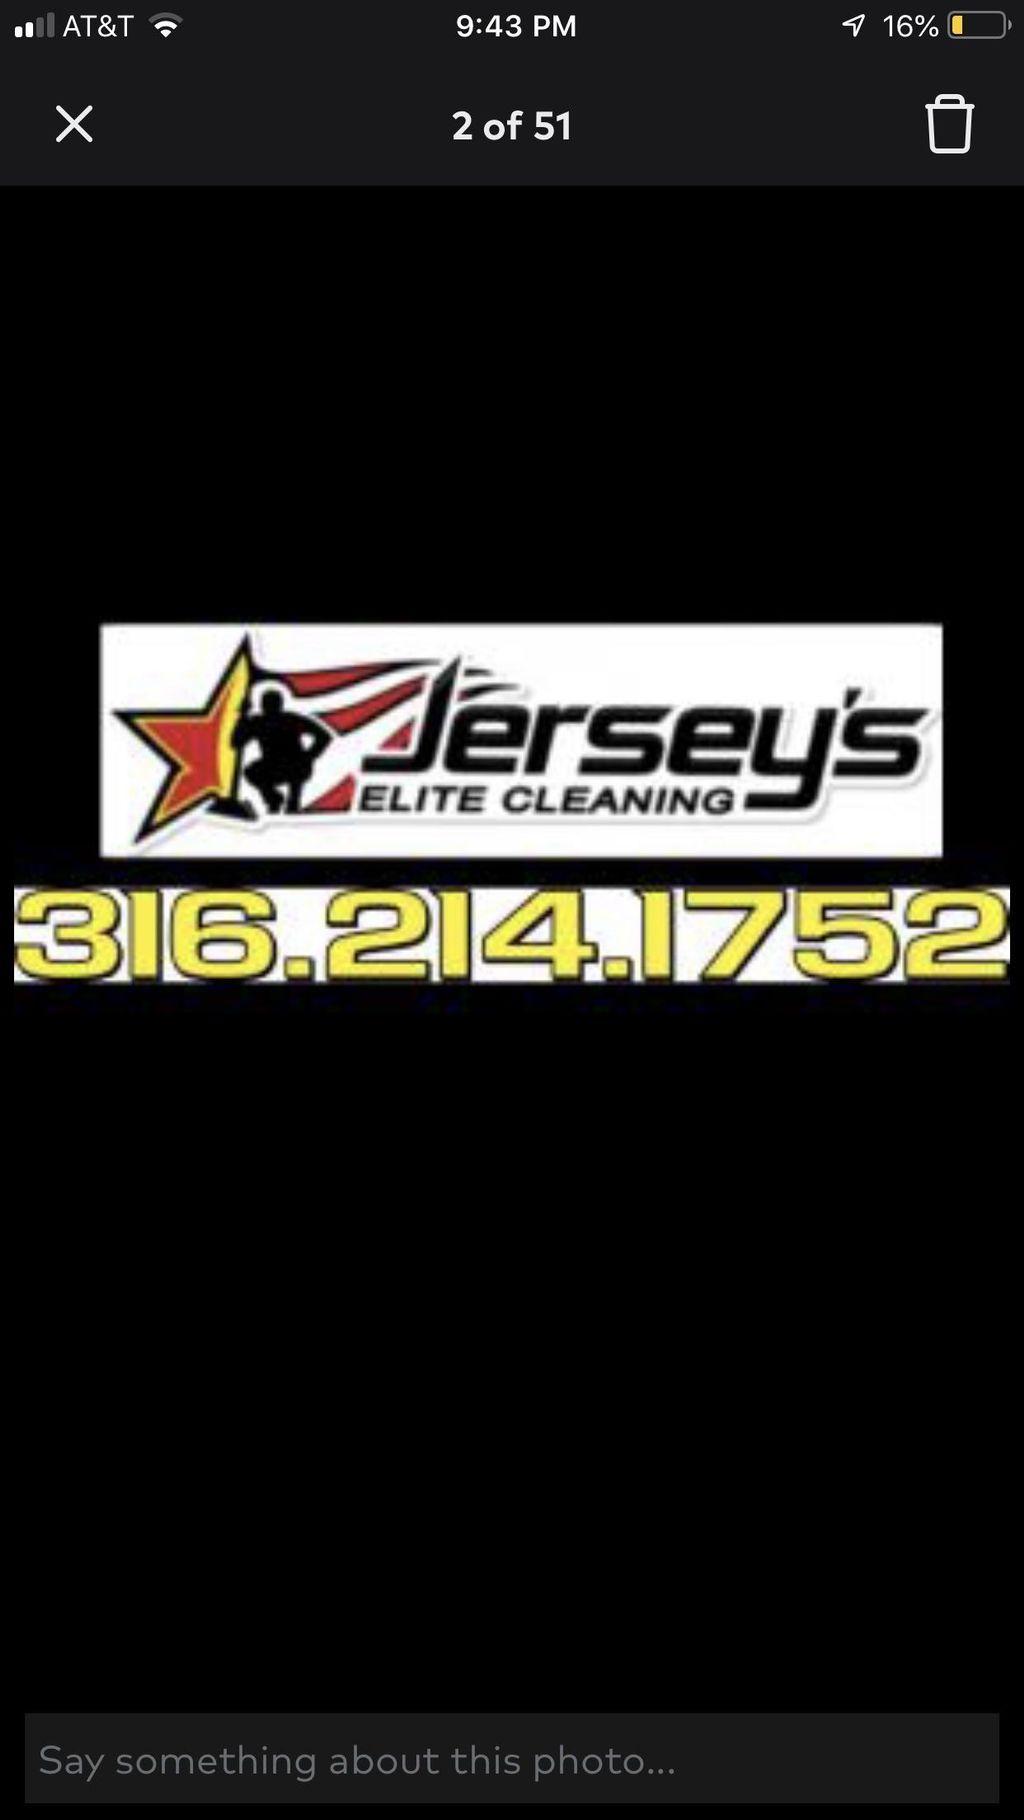 Jersey's Elite Cleaning LLC